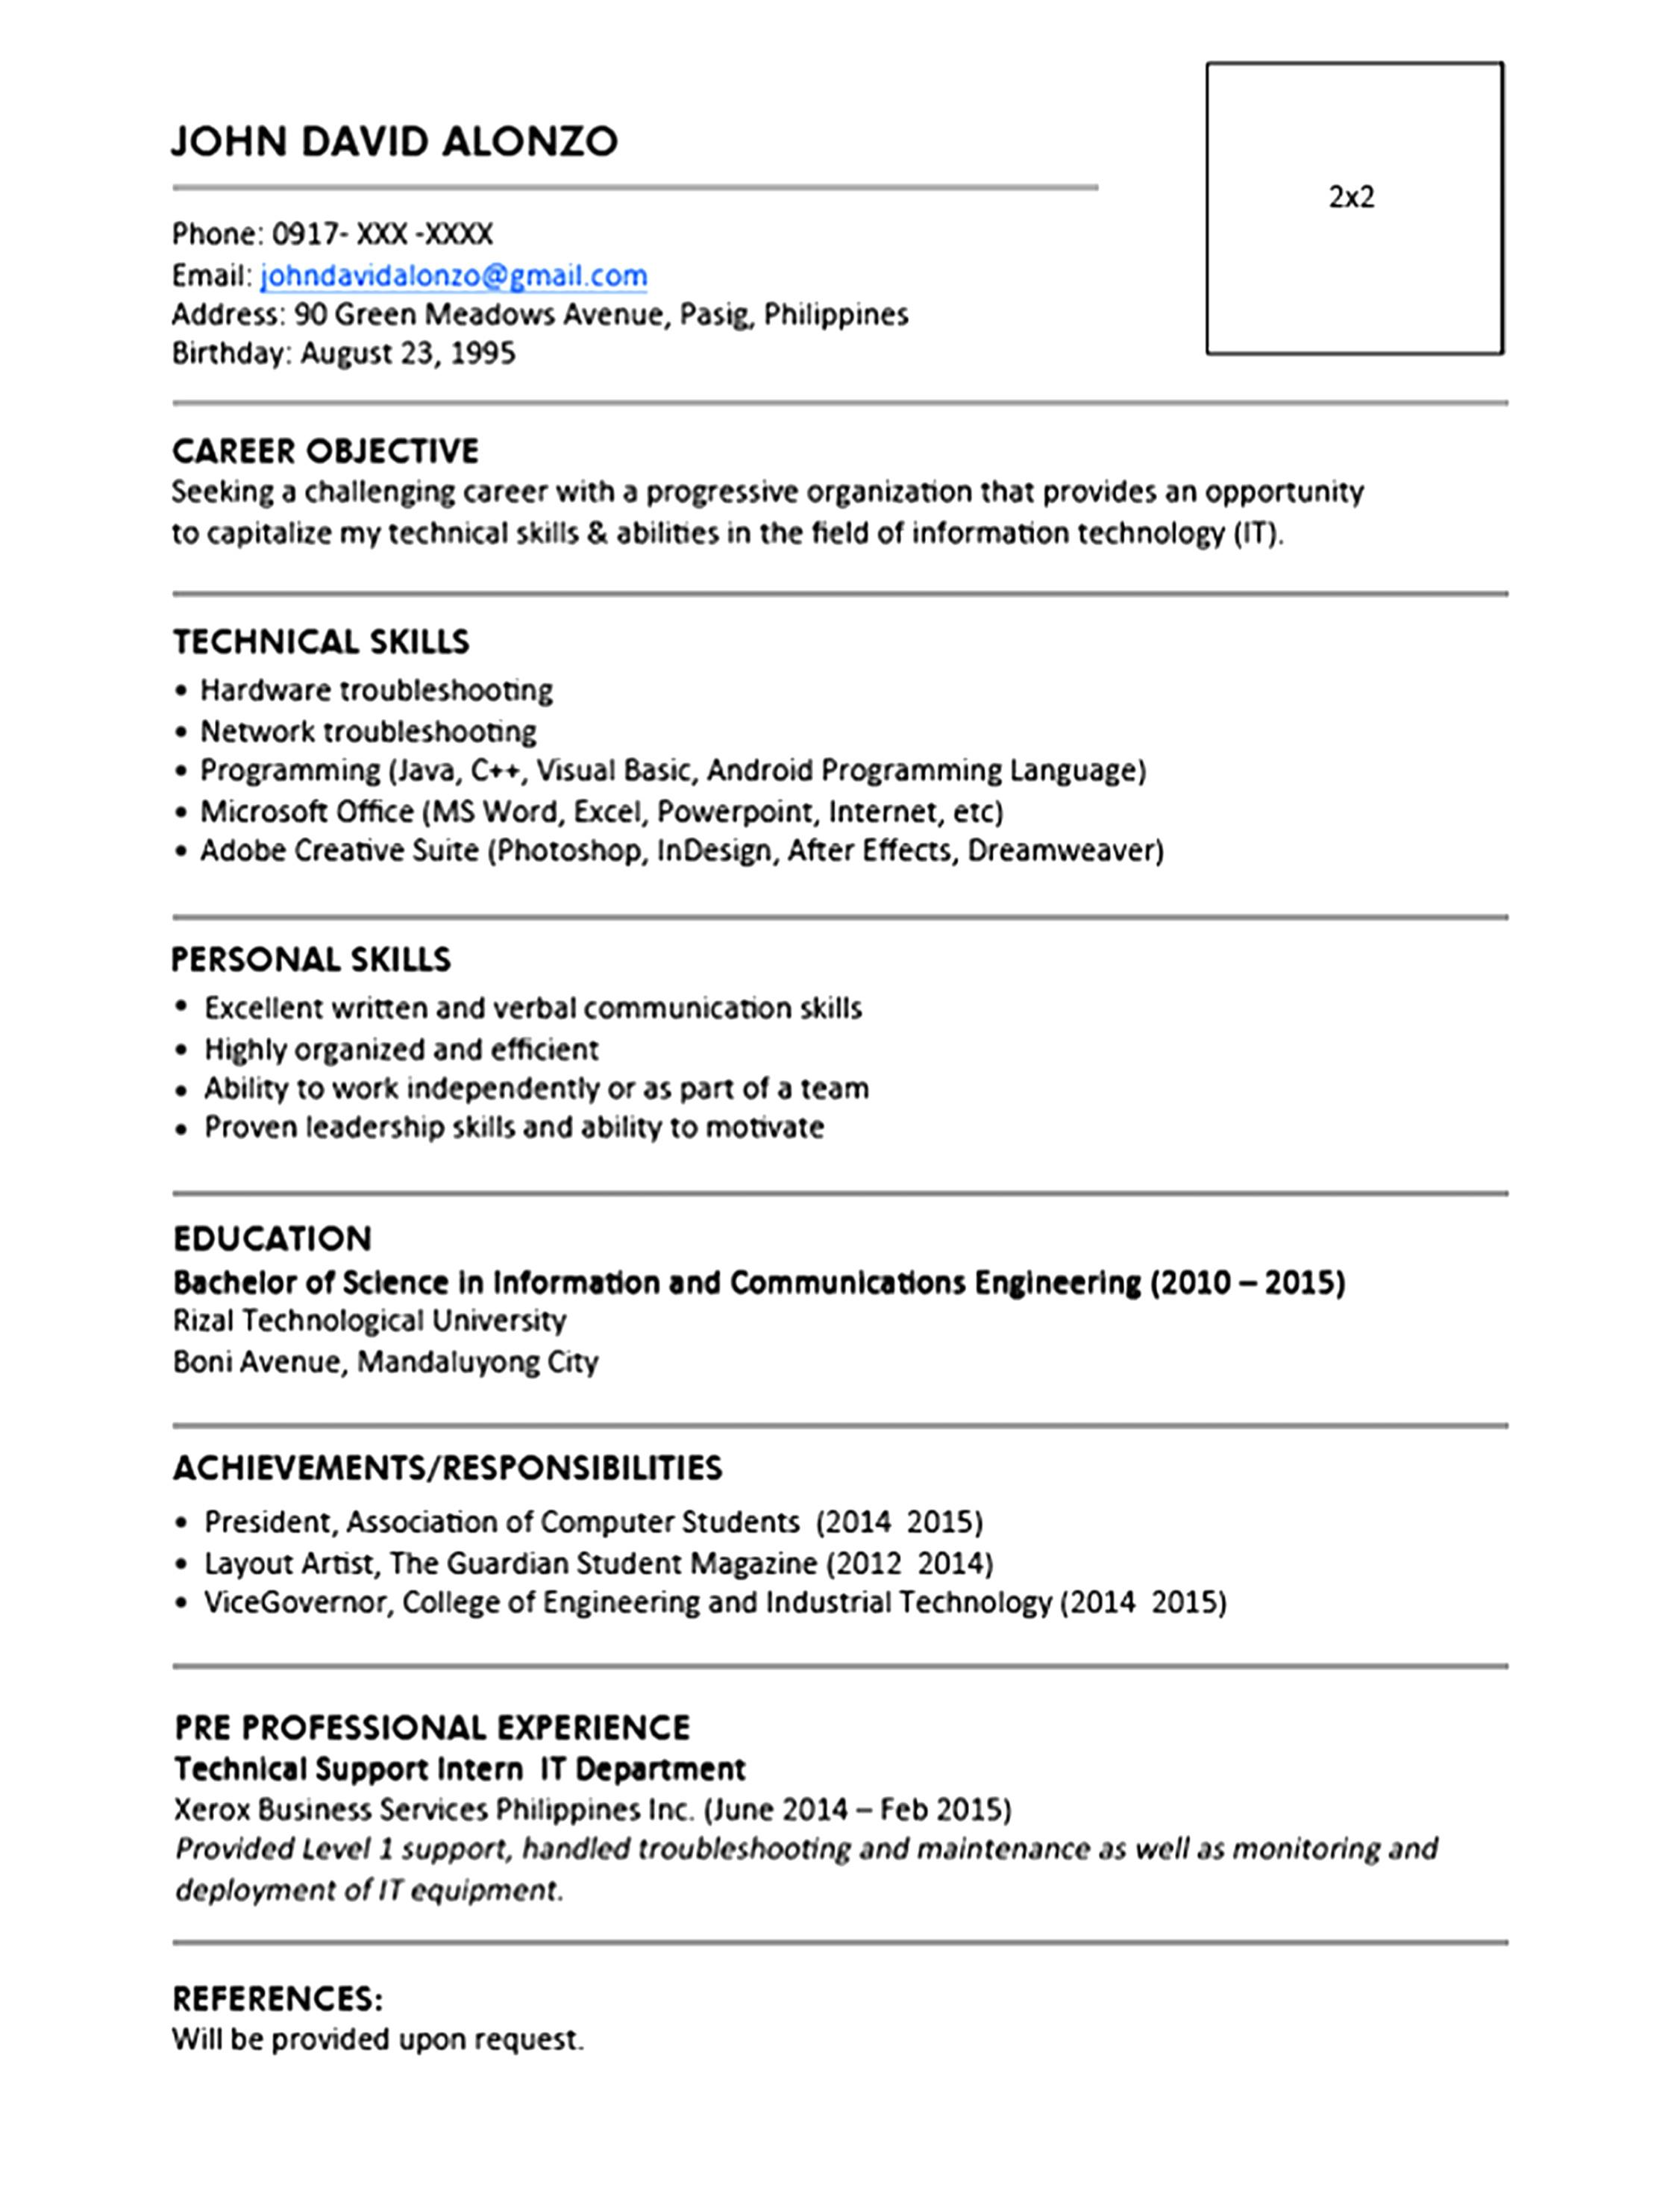 9 Cv Templates Word 2010 Uaopt Templatesz234 (Resume With Regard To Resume Templates Word 2010